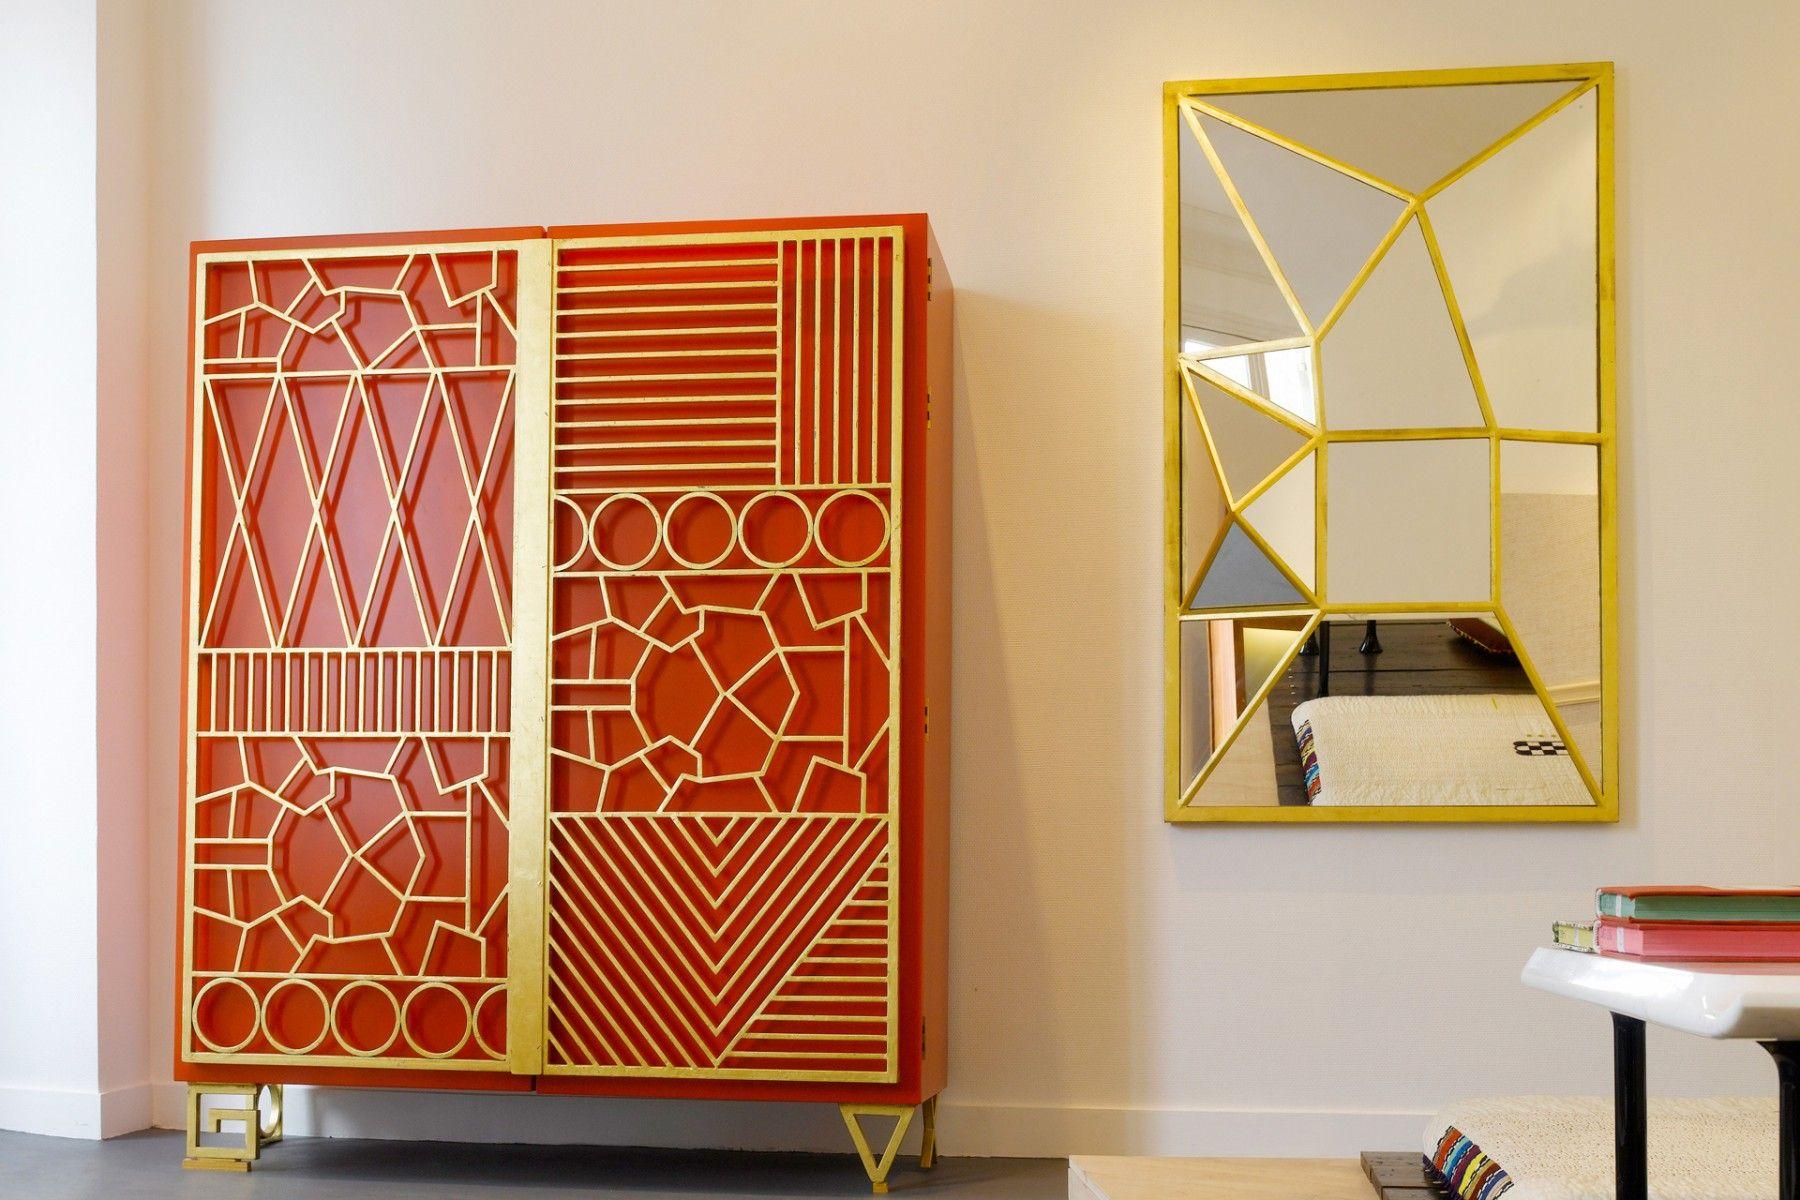 Geometric Cabinet By Elizabeth Garouste Singular And Exquisitely Crafted Geometric Cabinet Is Classic Garouste Art Deco Interior Deco Decor Art Deco Decor